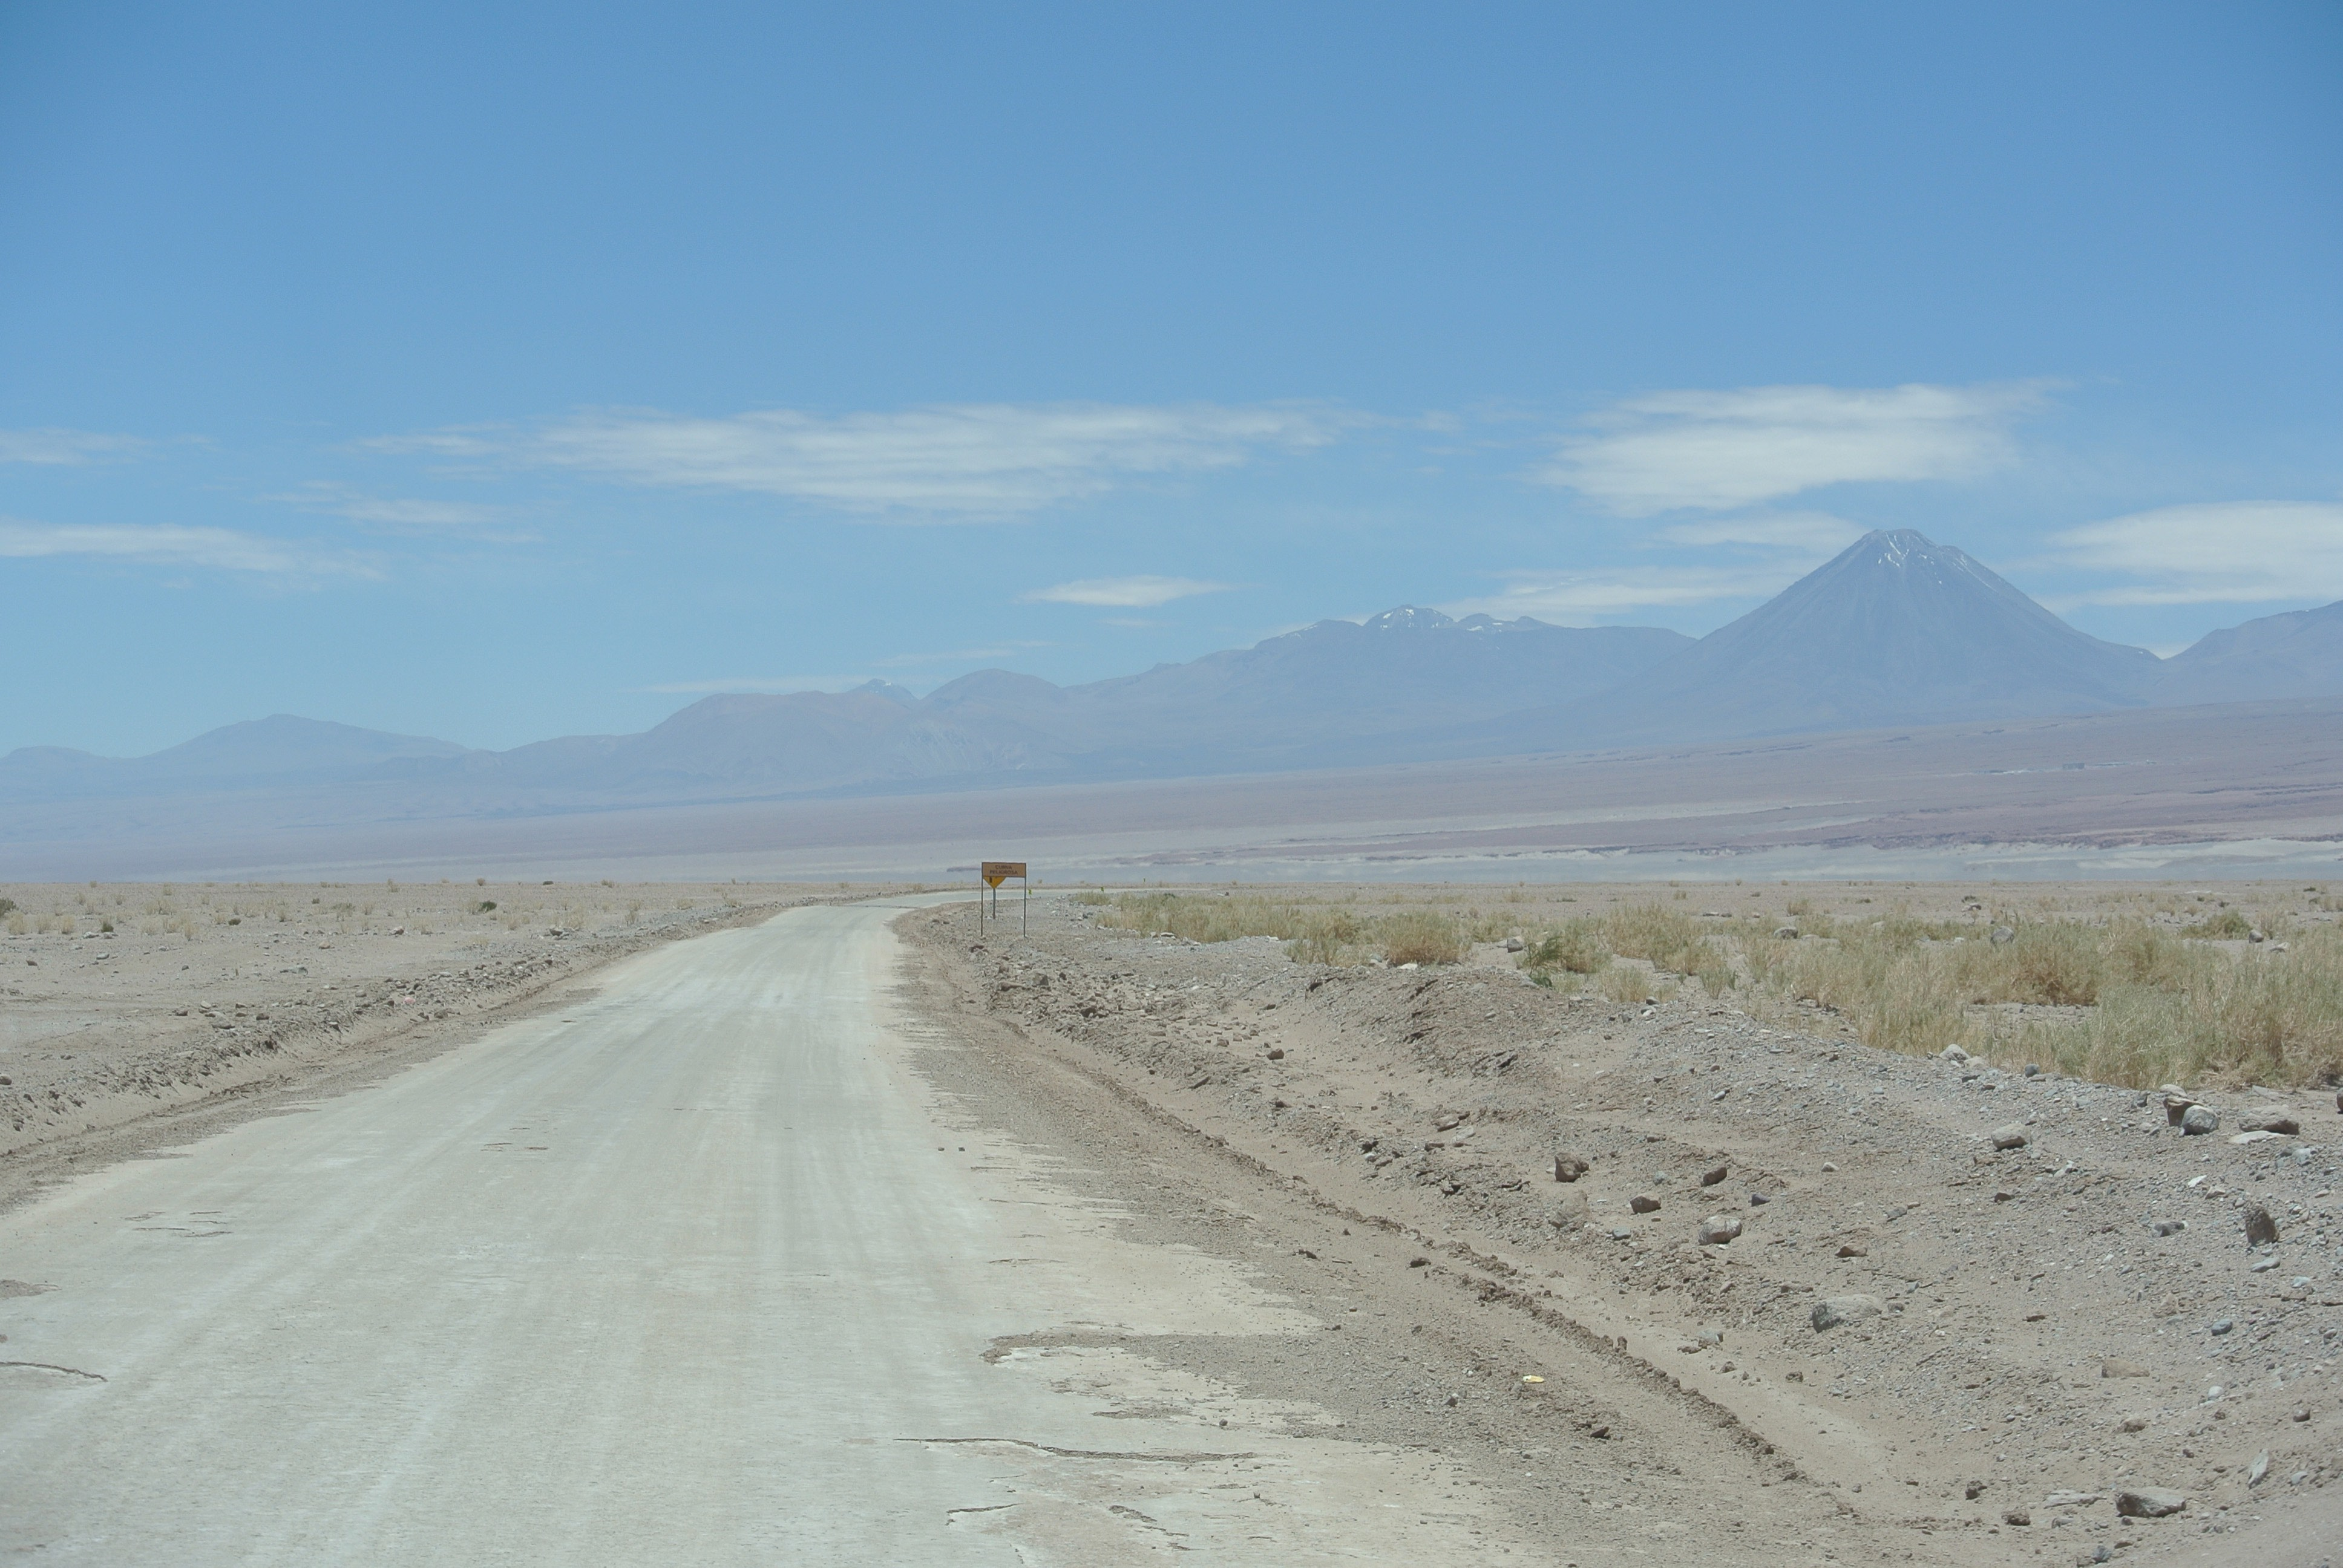 0221 0912 Mirador - Salar de Atacama 128jpeg